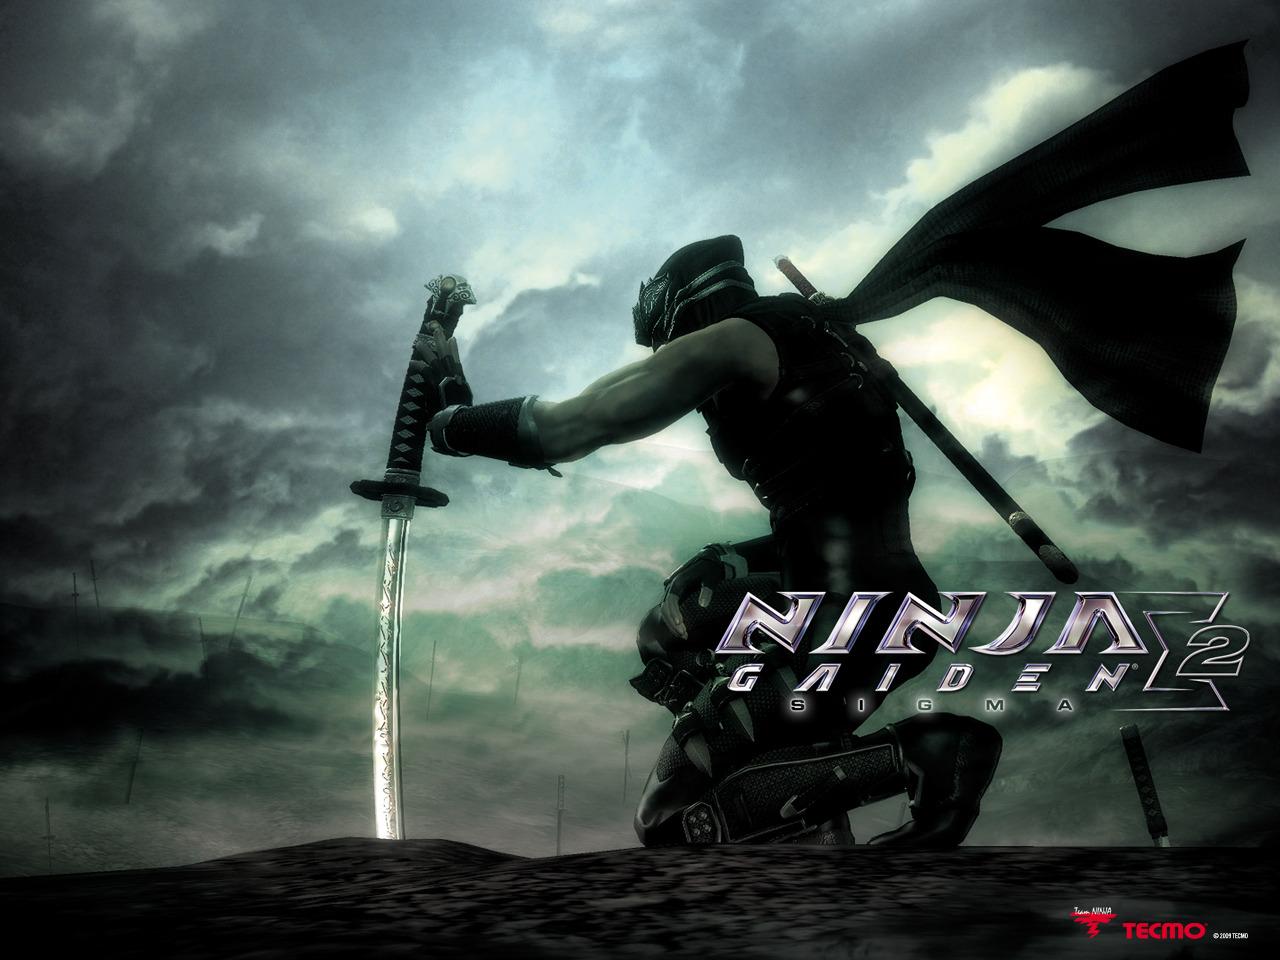 fond d'ecran ninja